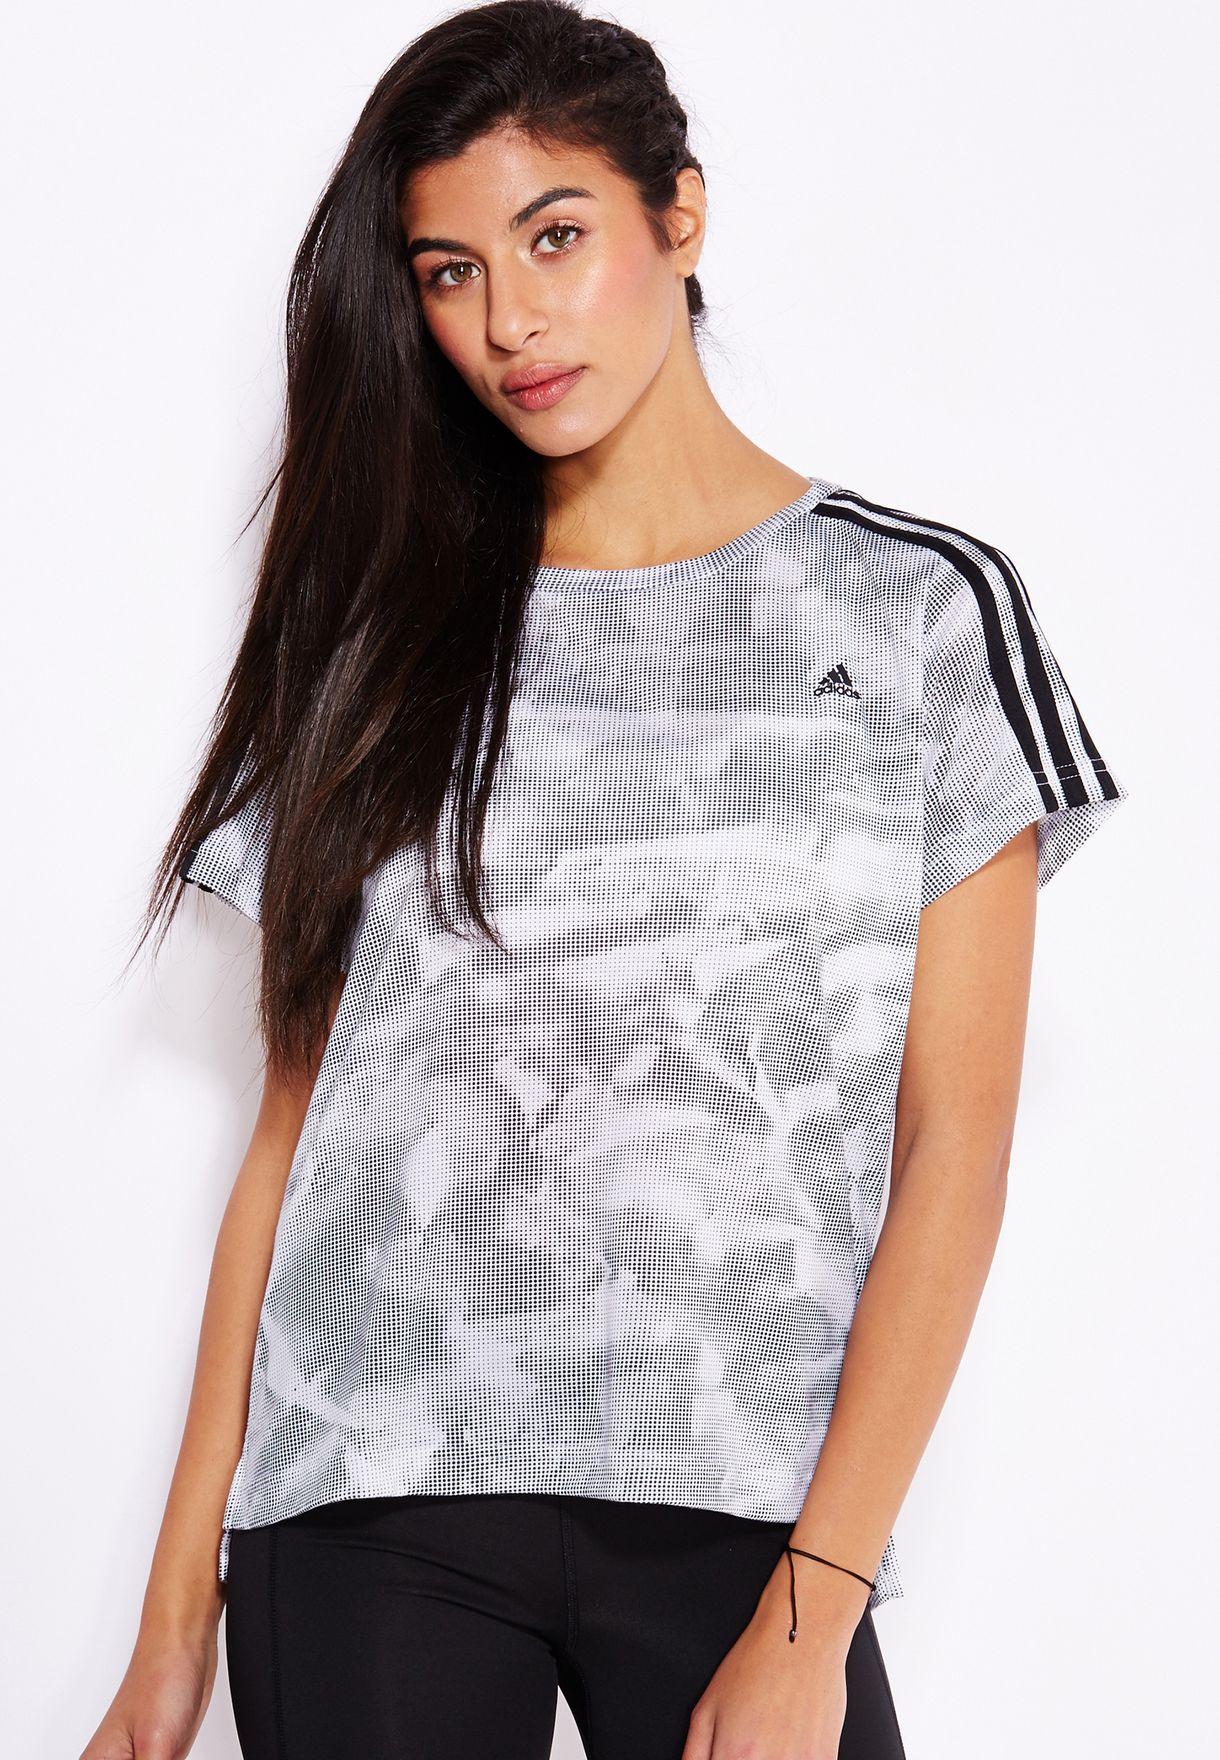 59d1779f Shop adidas monochrome Paper Print T-Shirt AJ4672 for Women in ...